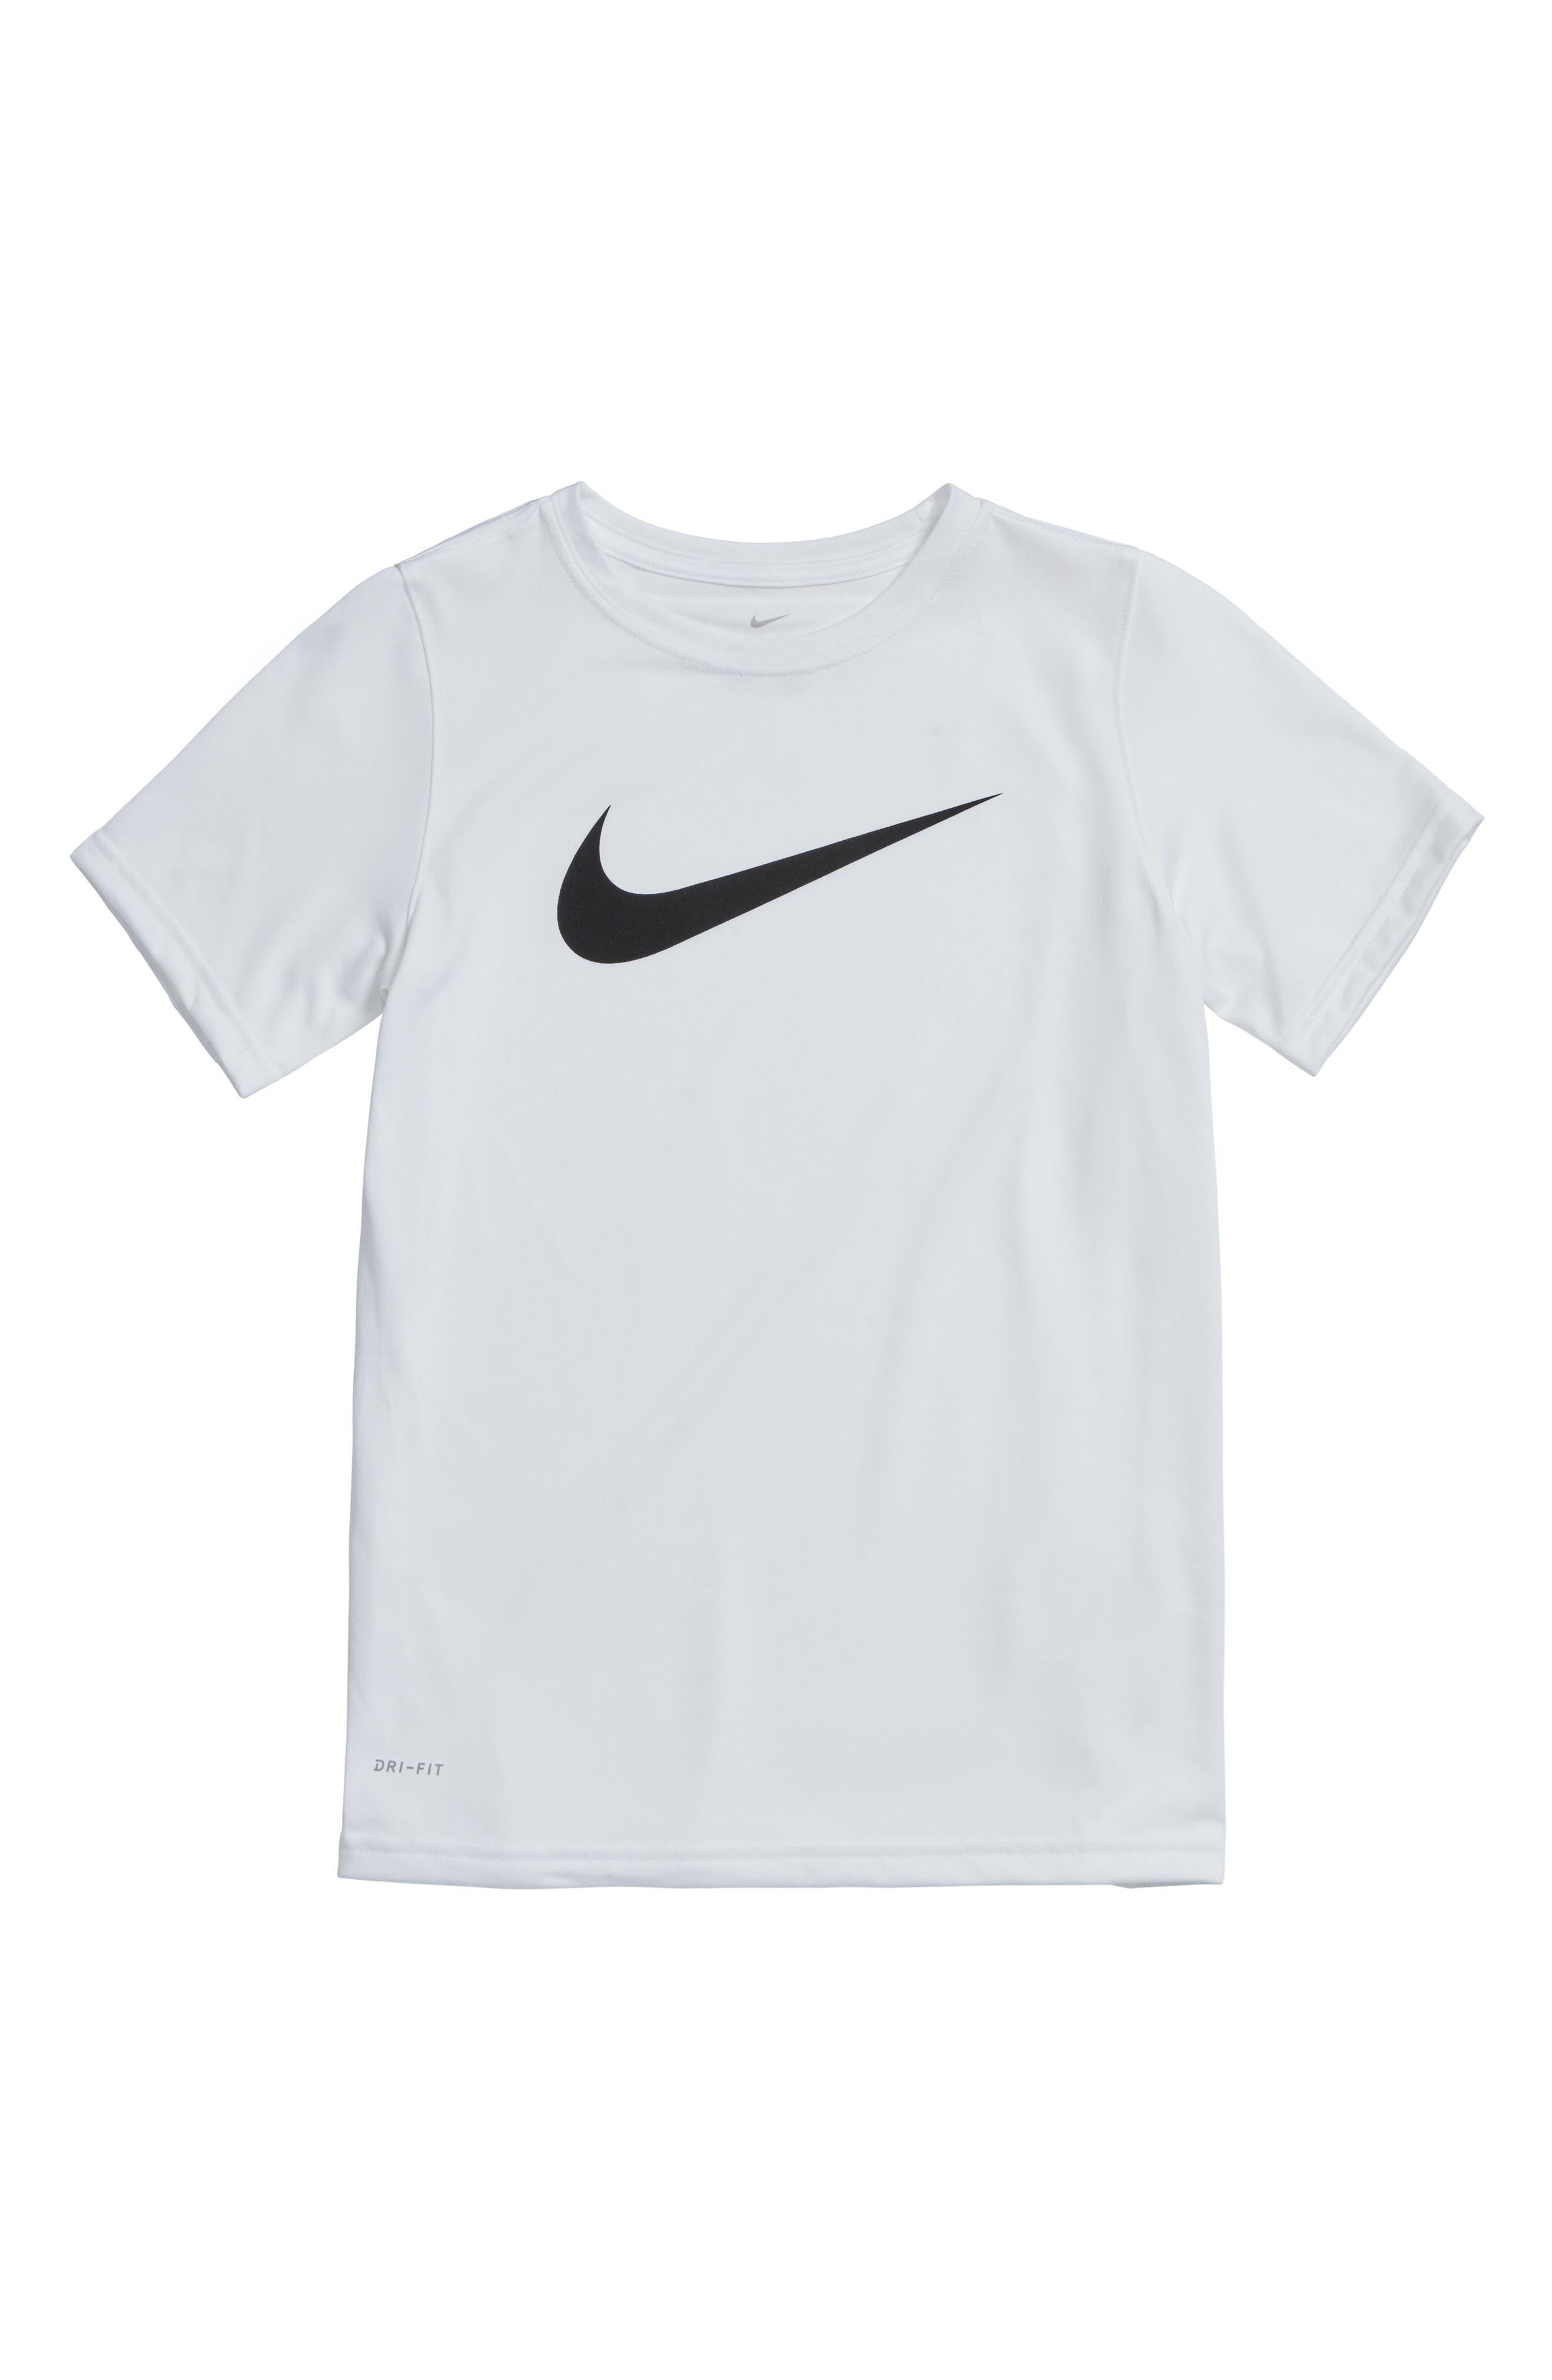 Nike Dry Swoosh T-Shirt (Little Boys & Big Boys) (Regular Retail Price: $20.00)